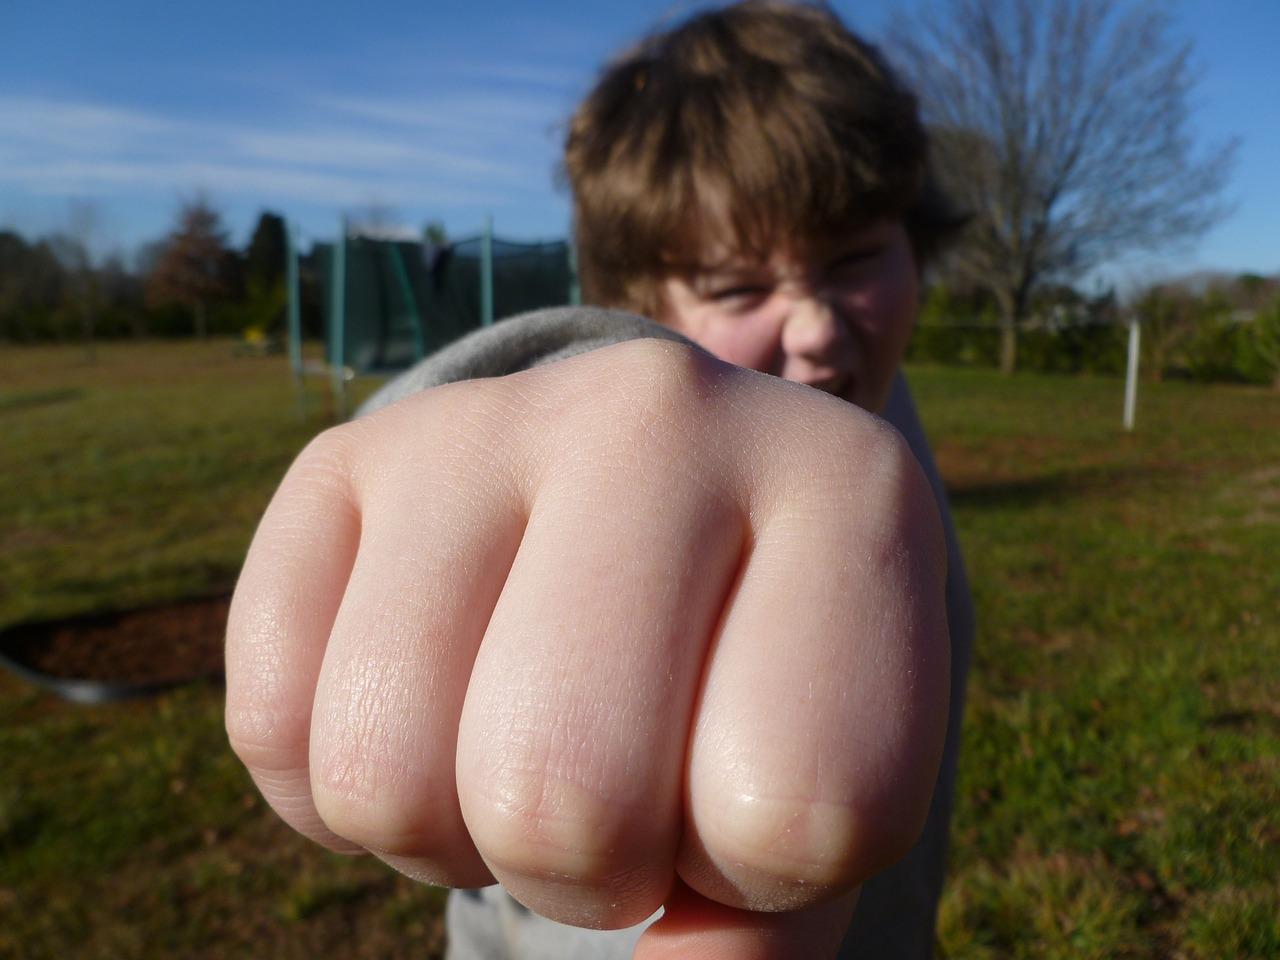 fist-bump-933916_1280